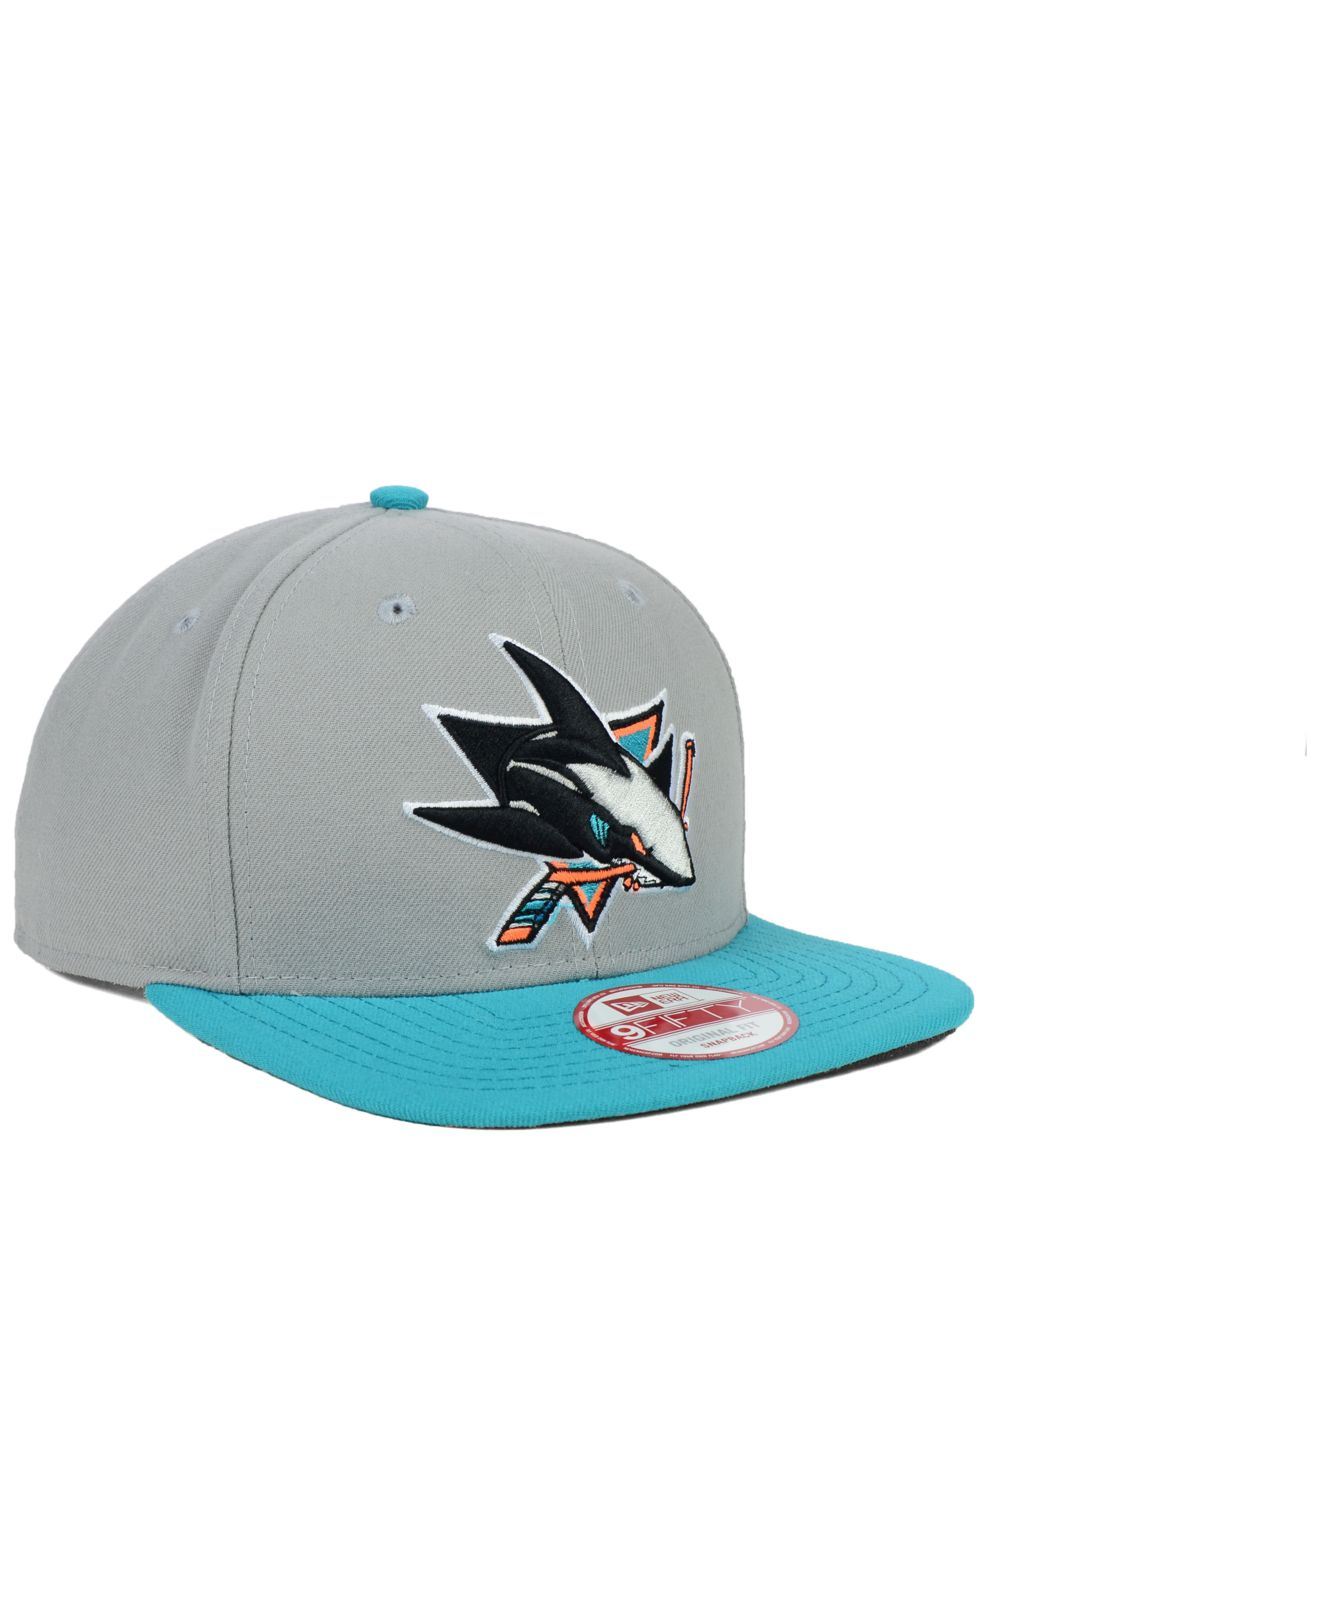 4a3c1dba7 ... where can i buy lyst ktz san jose sharks nhl bright ice up 9fifty  snapback cap